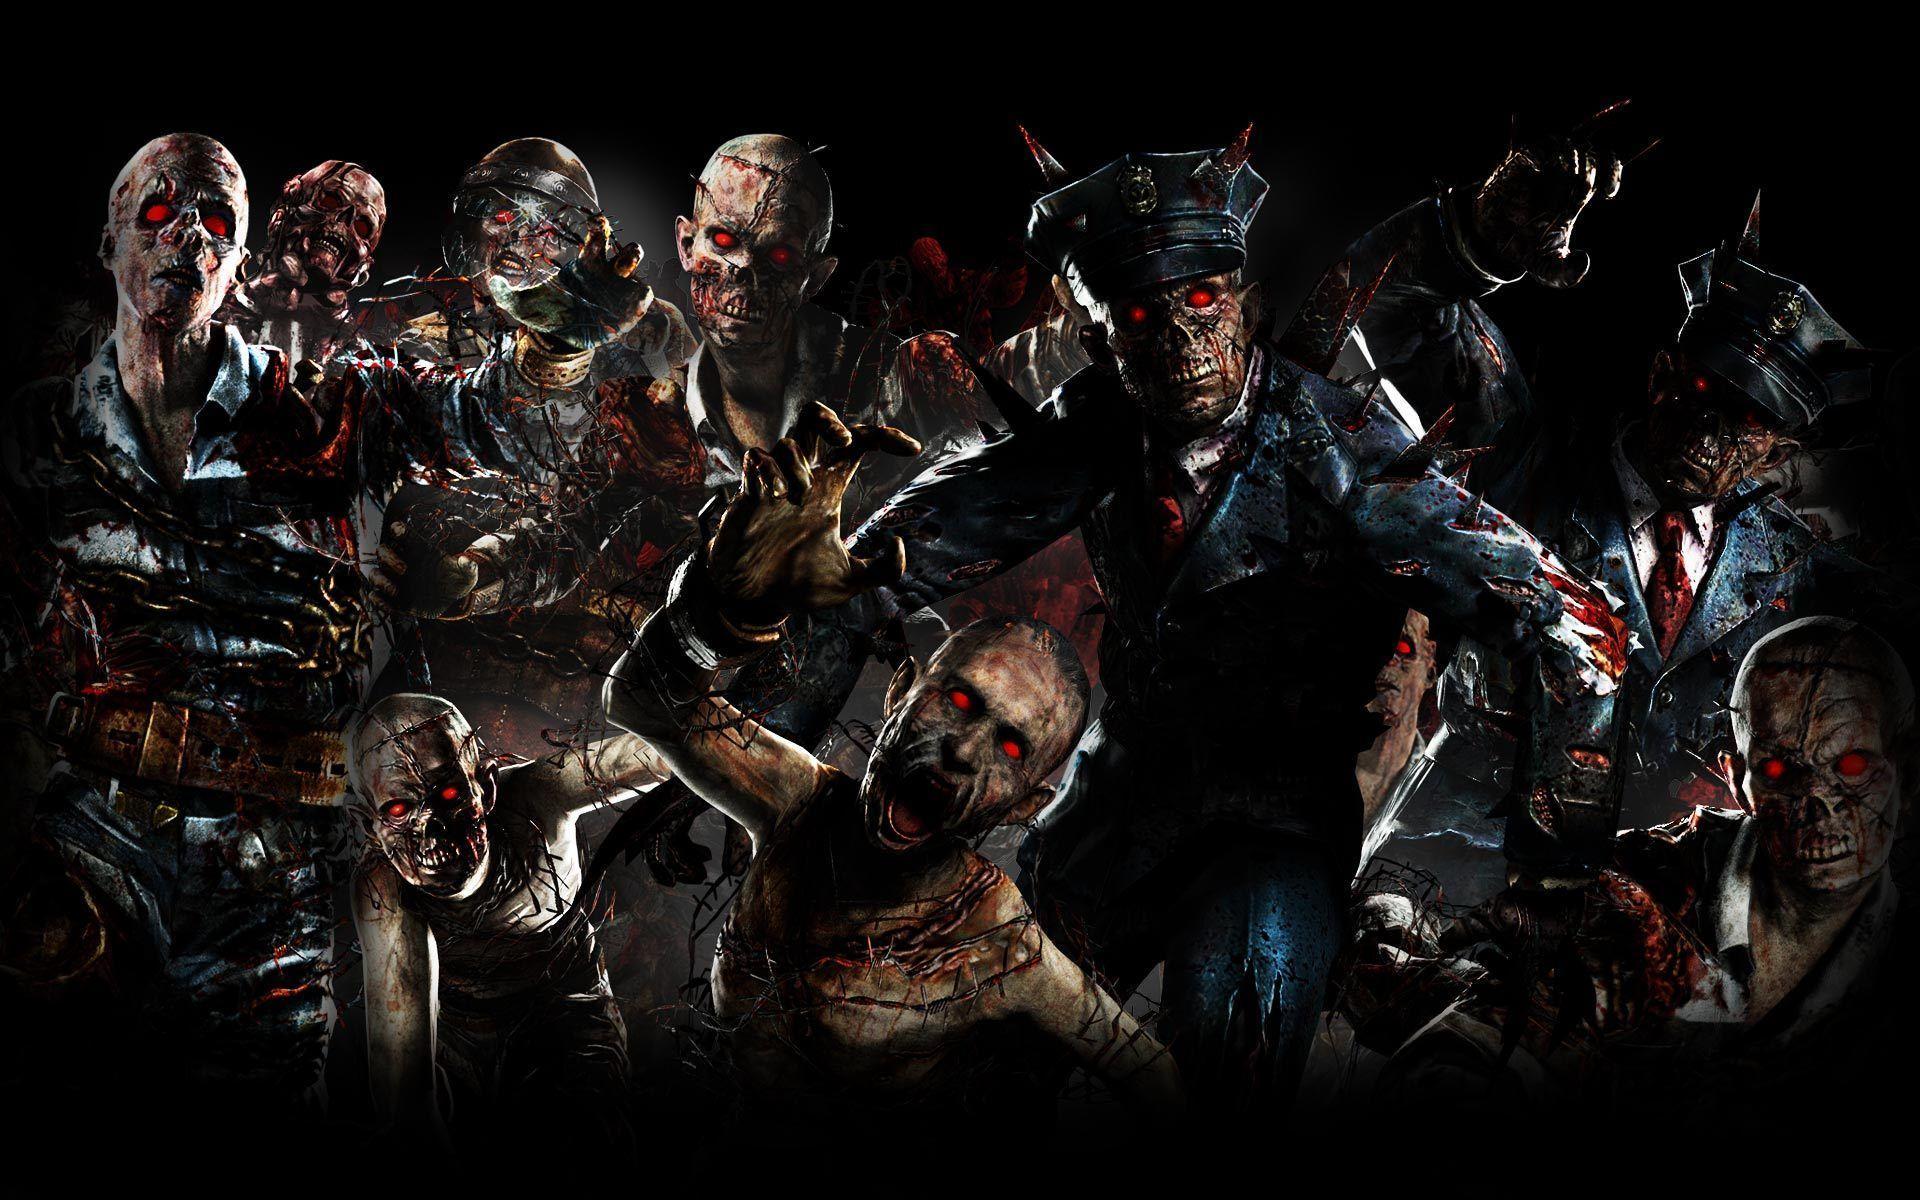 Zombies Wallpaper Hd Posted By John Mercado